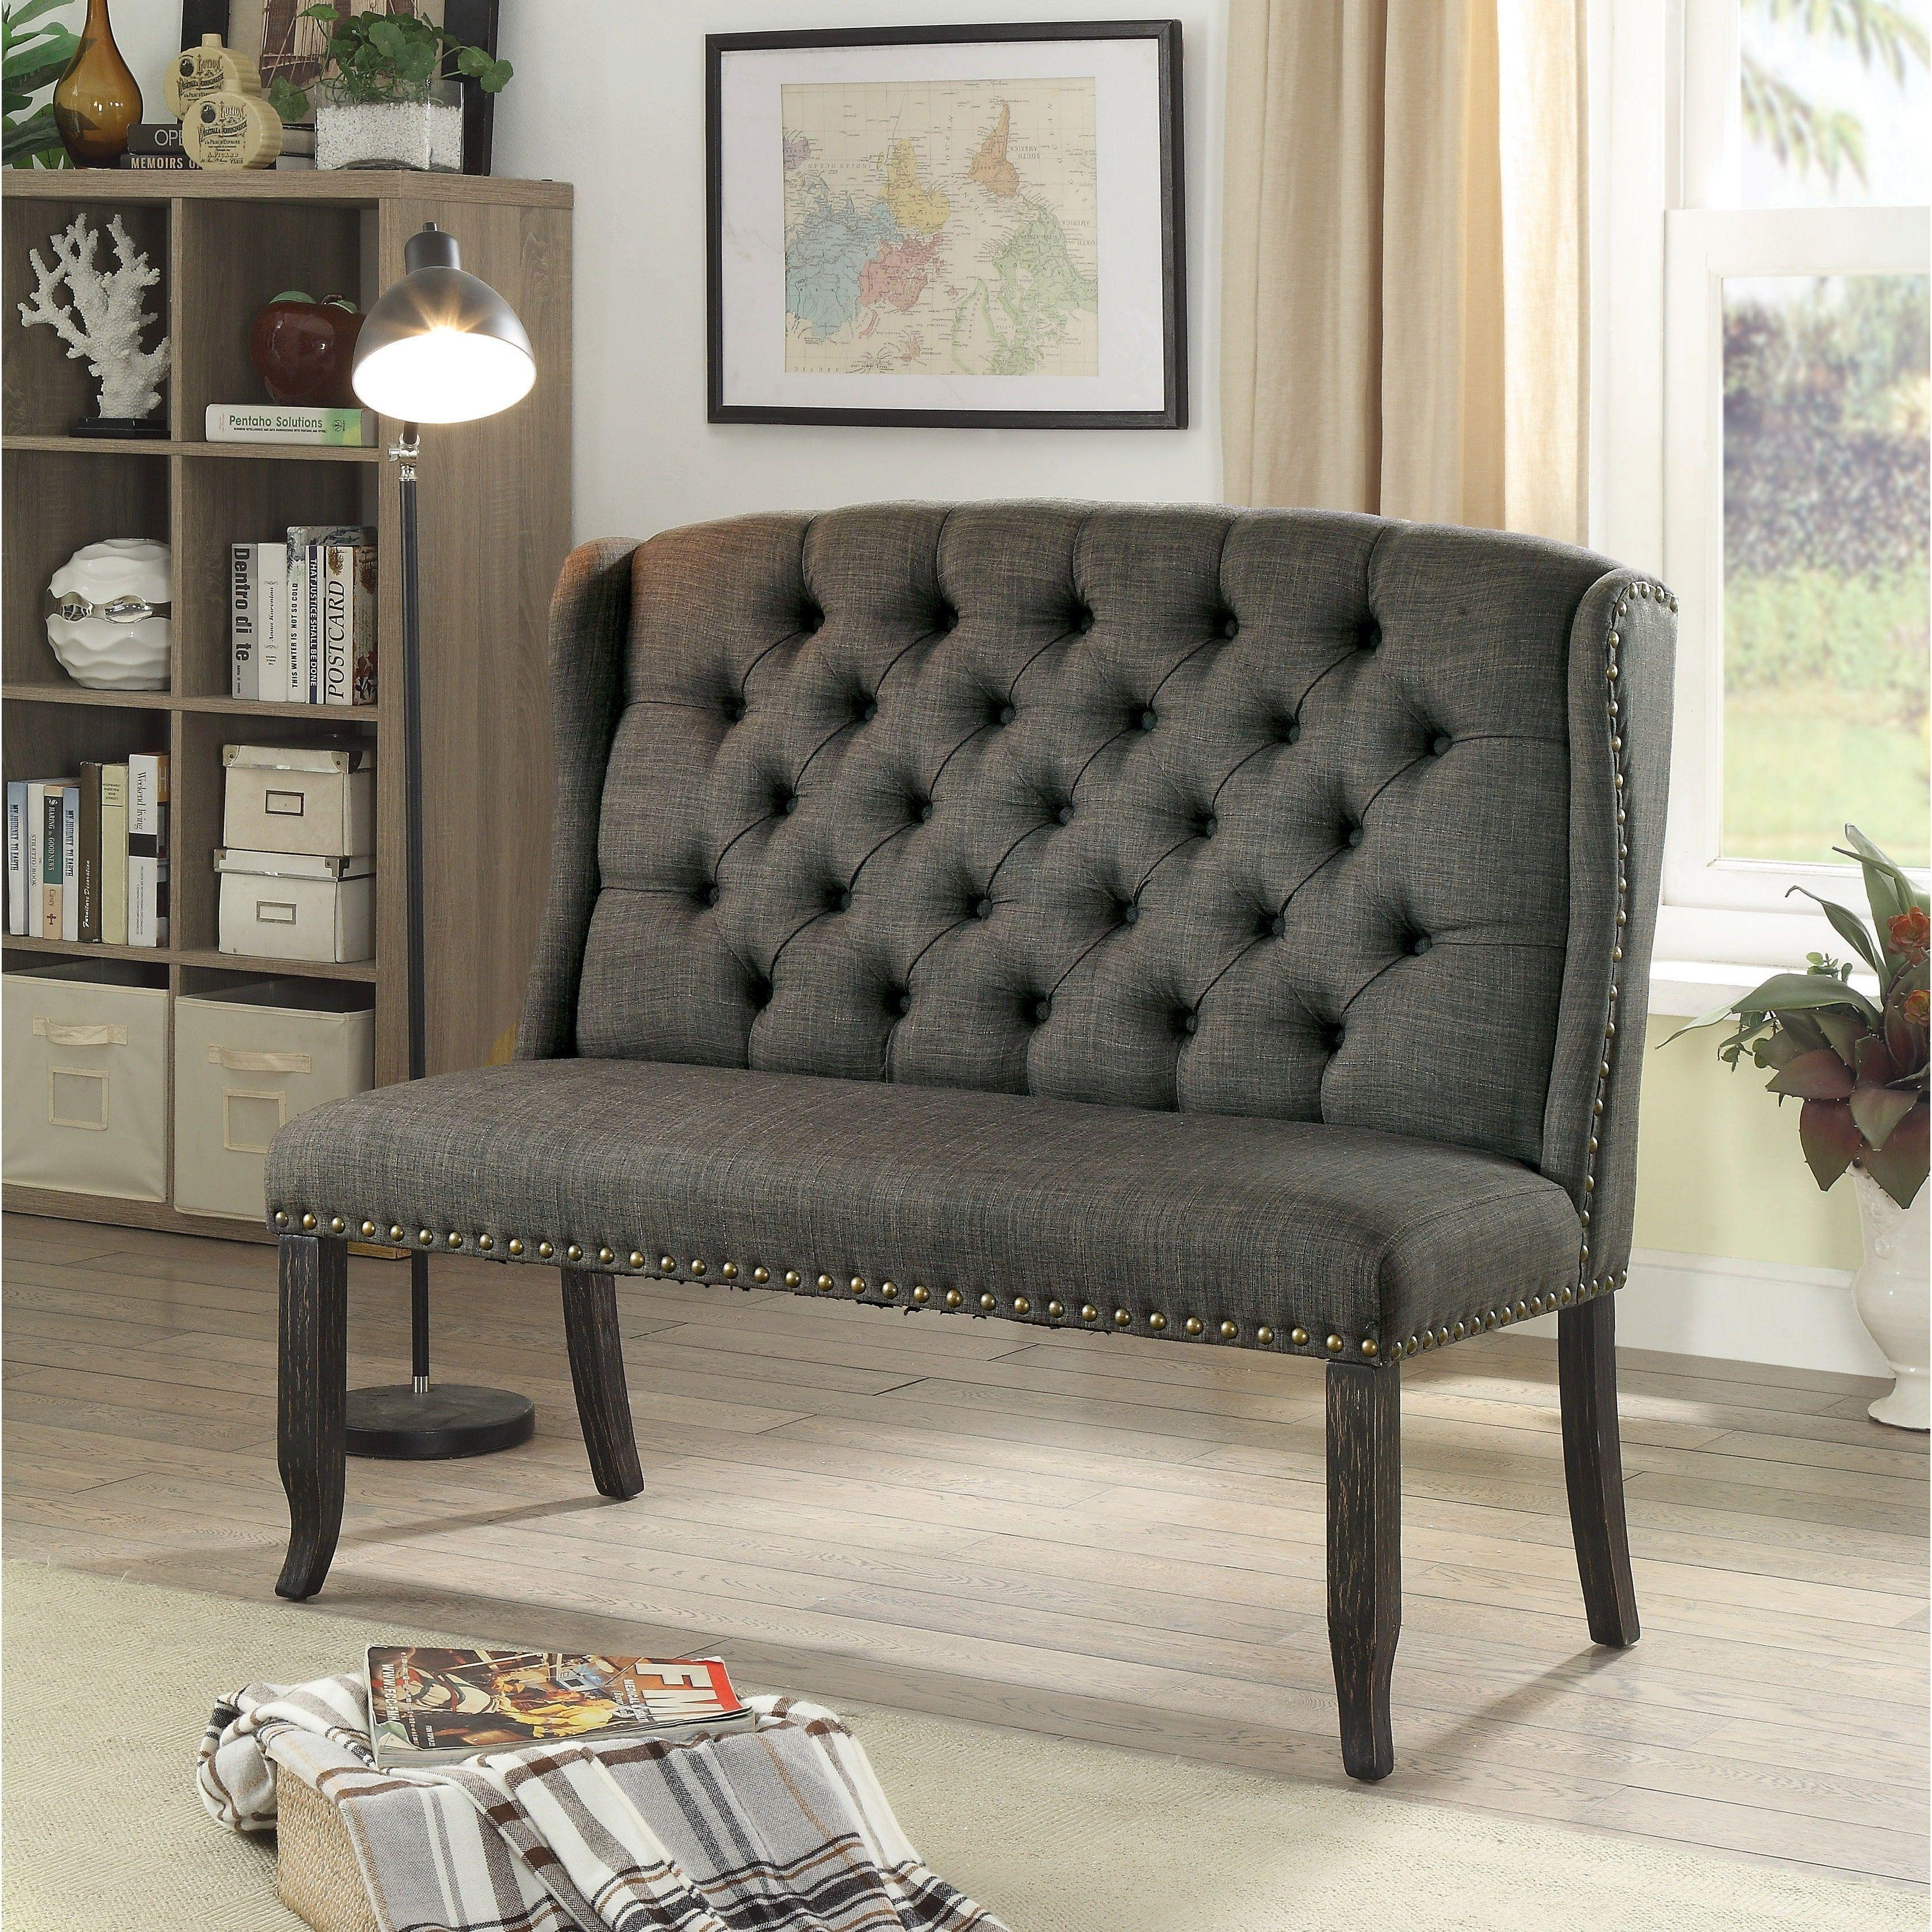 Fabulous Furniture Of America Telara Foam Contemporary Tufted Bralicious Painted Fabric Chair Ideas Braliciousco